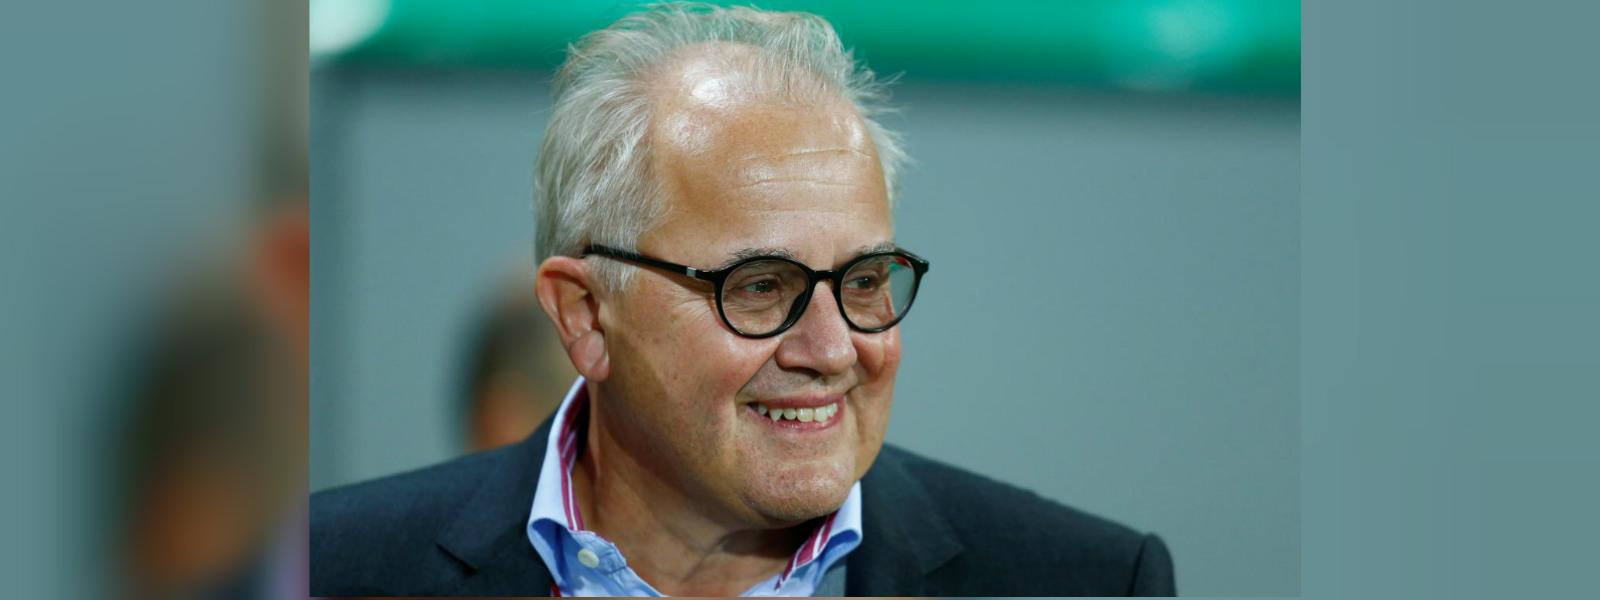 Freiburg boss Keller proposed as next DFB president